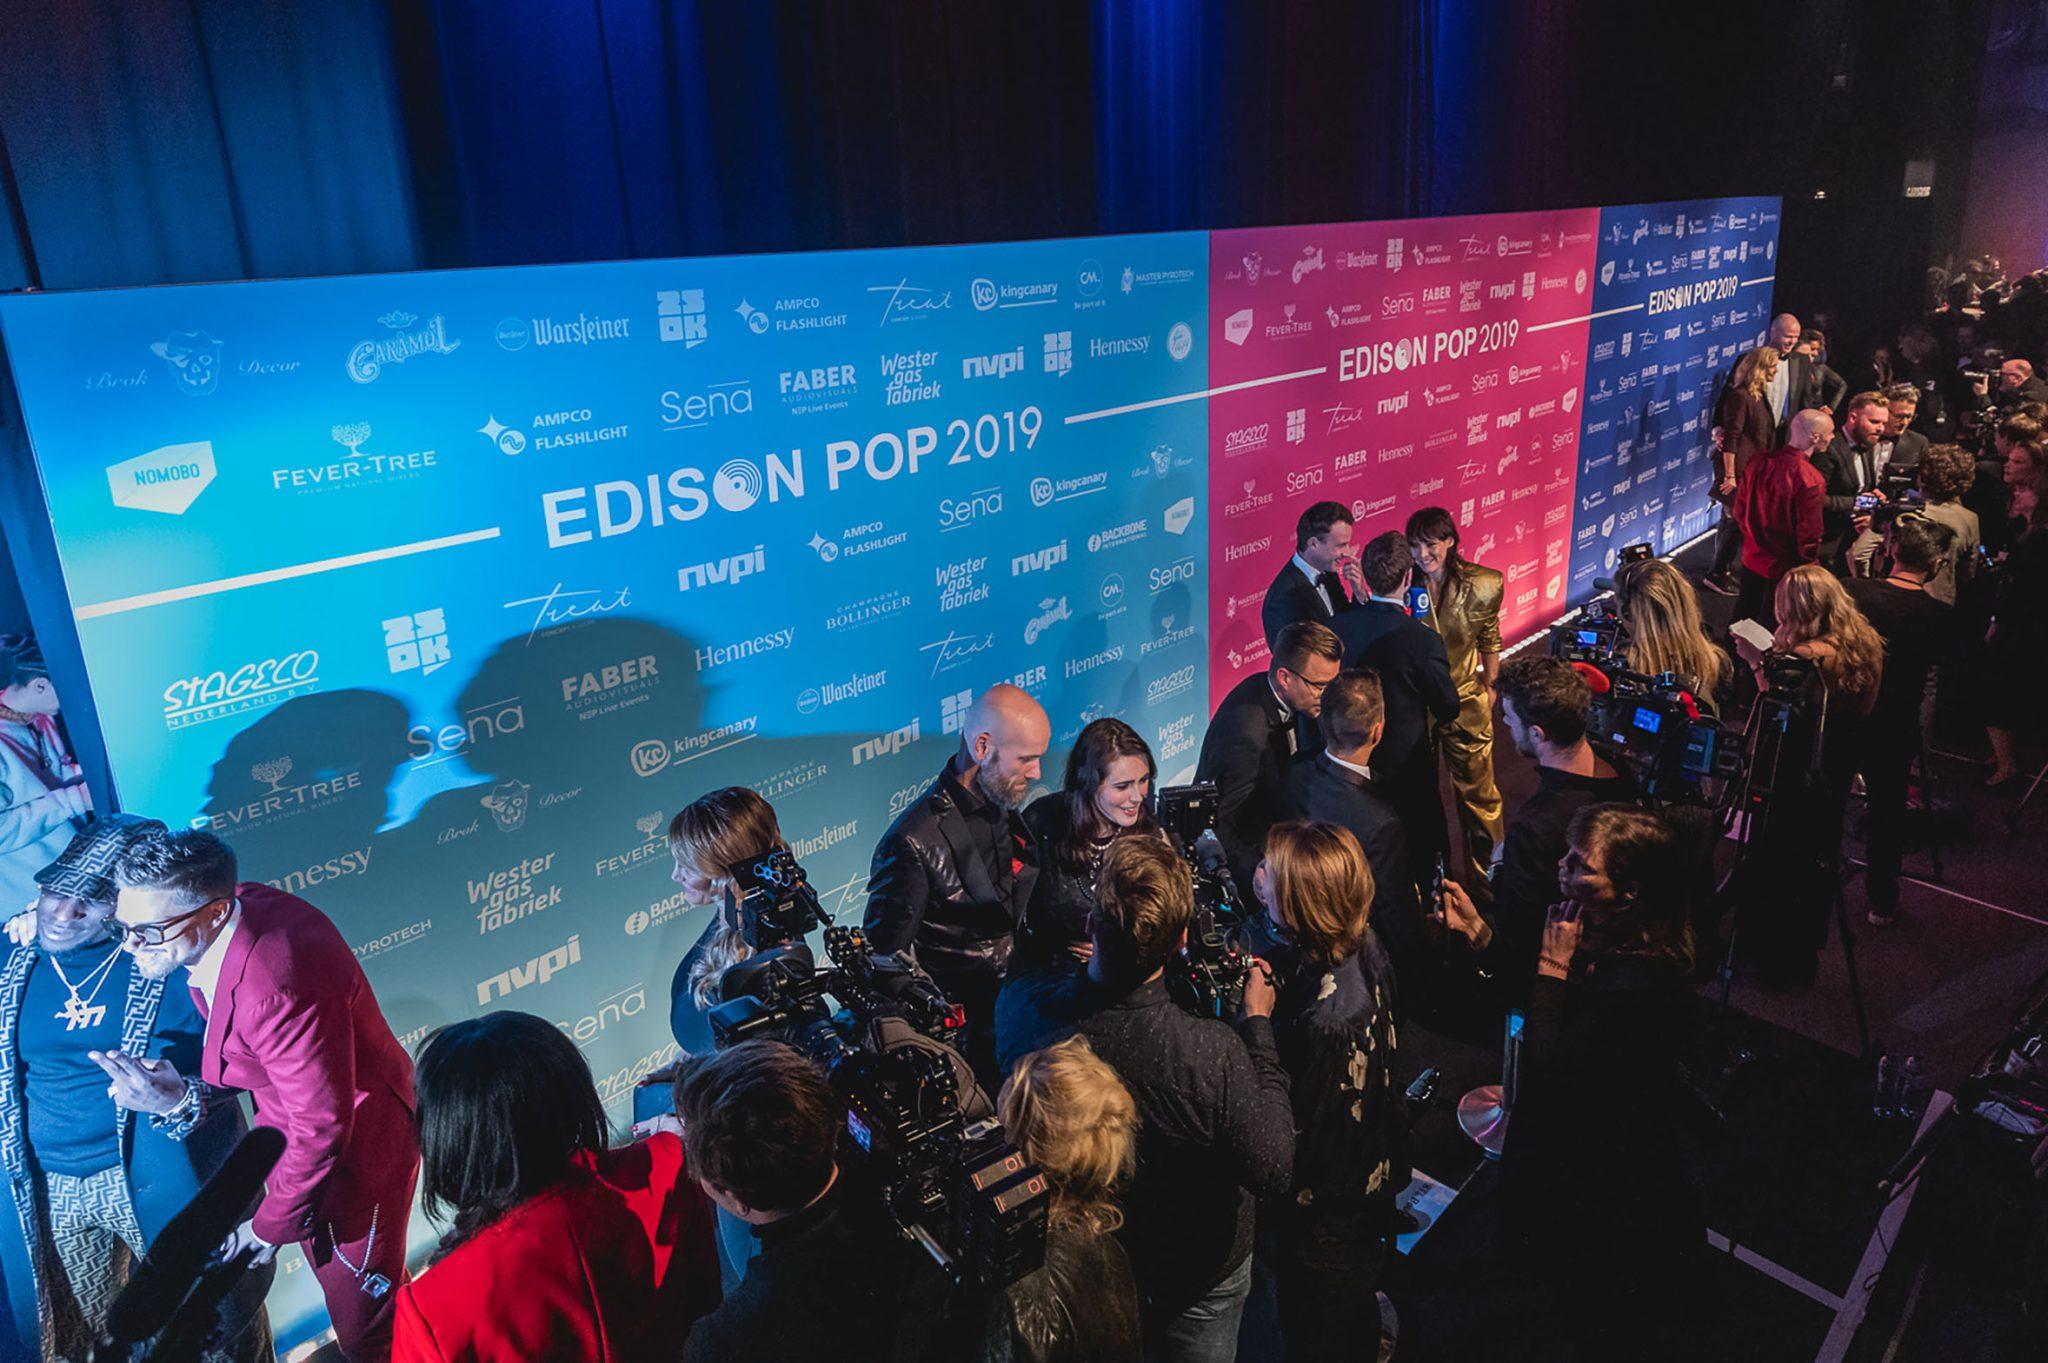 Edison Pop 2019